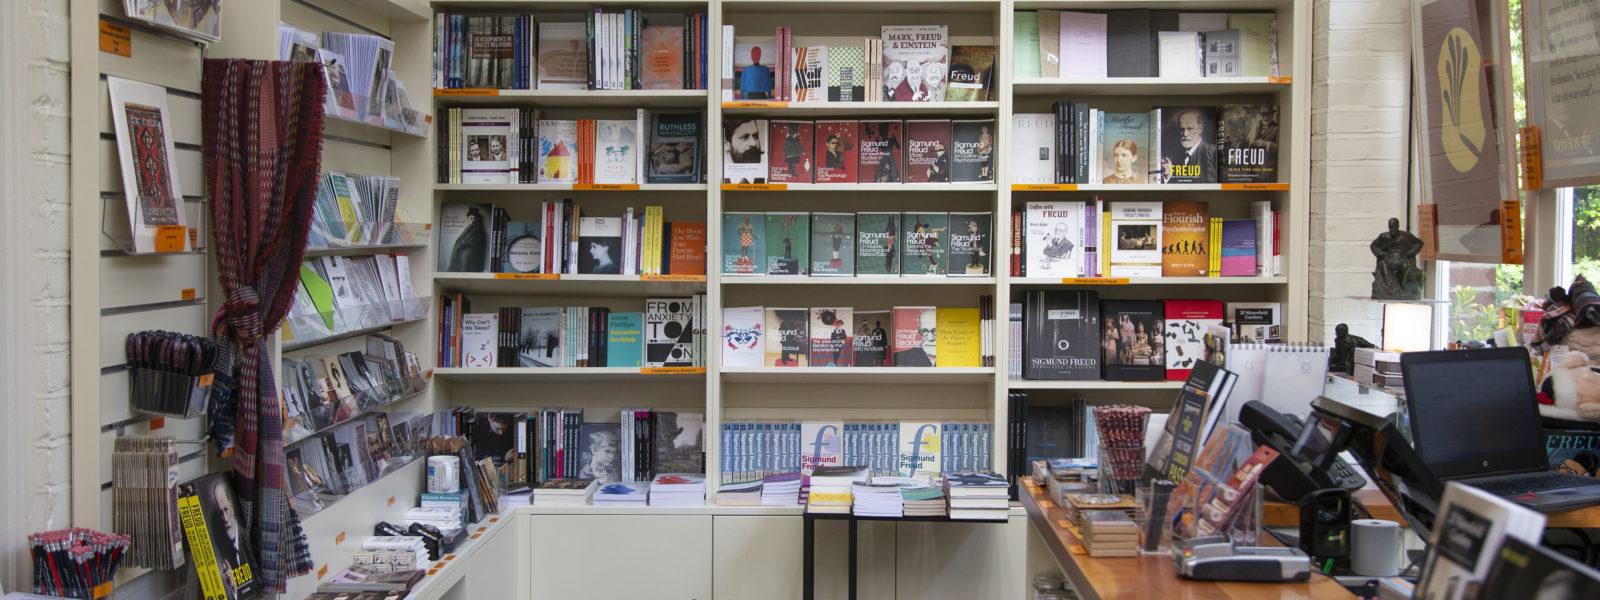 London Bookshop Crawl 2020 Freud Museum Bookshop